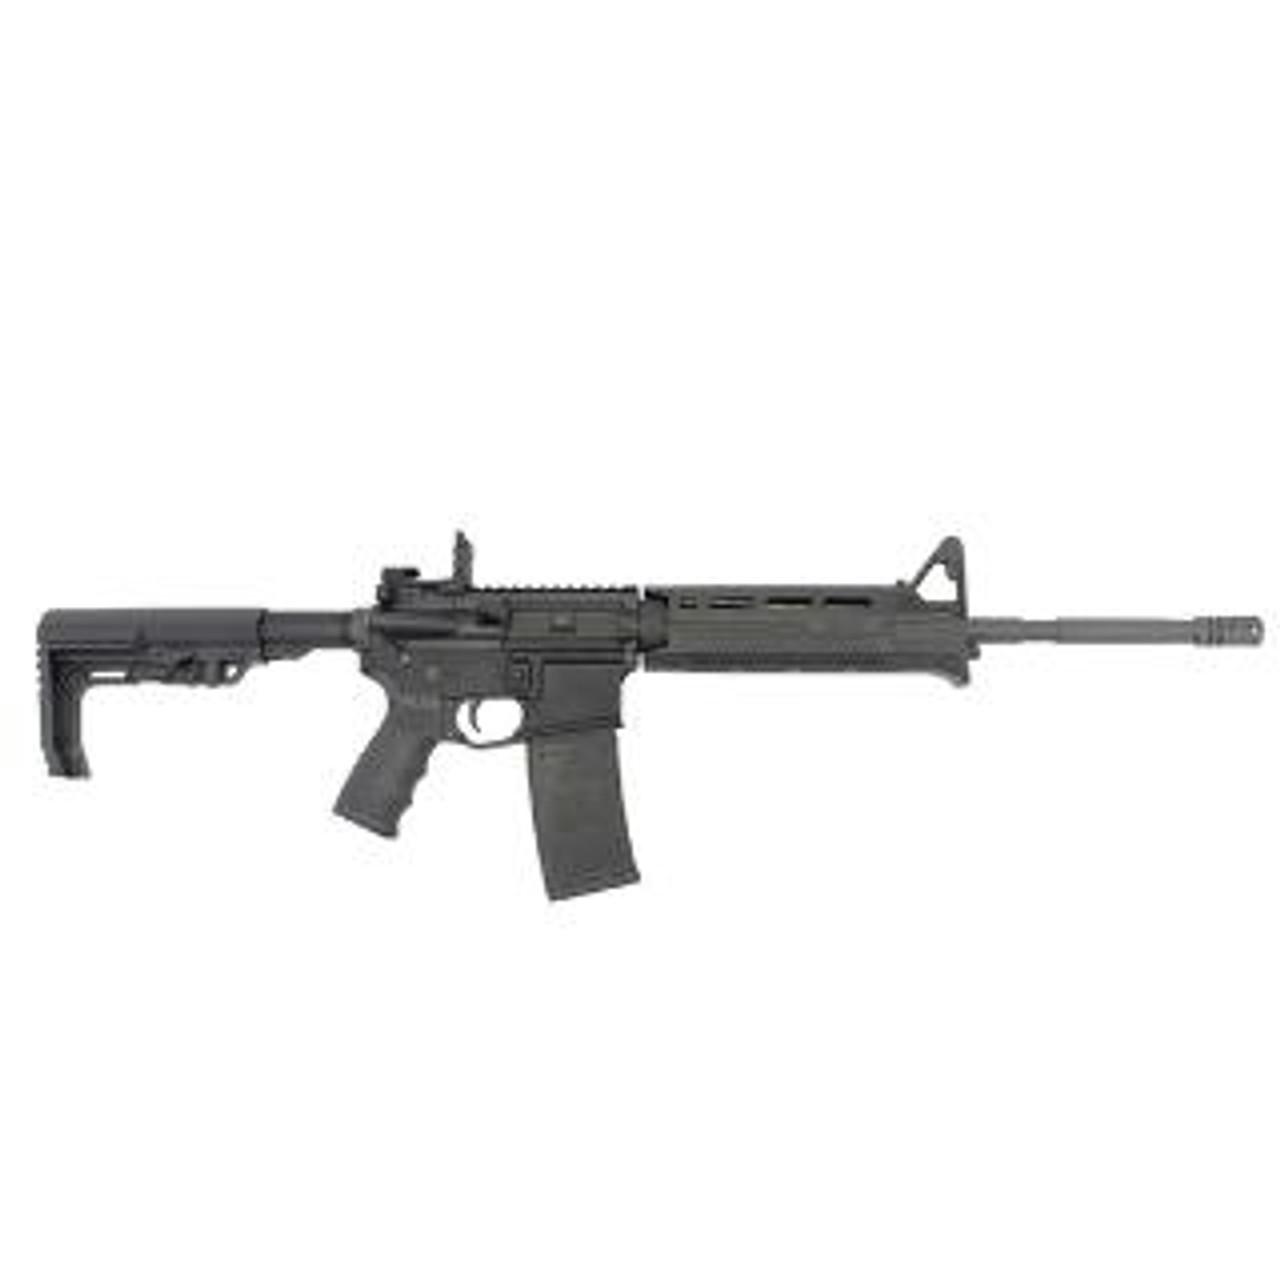 Stag Arms 15 Minimalist Semi-Auto Rifle CALIFORNIA LEGAL - .223/5.56